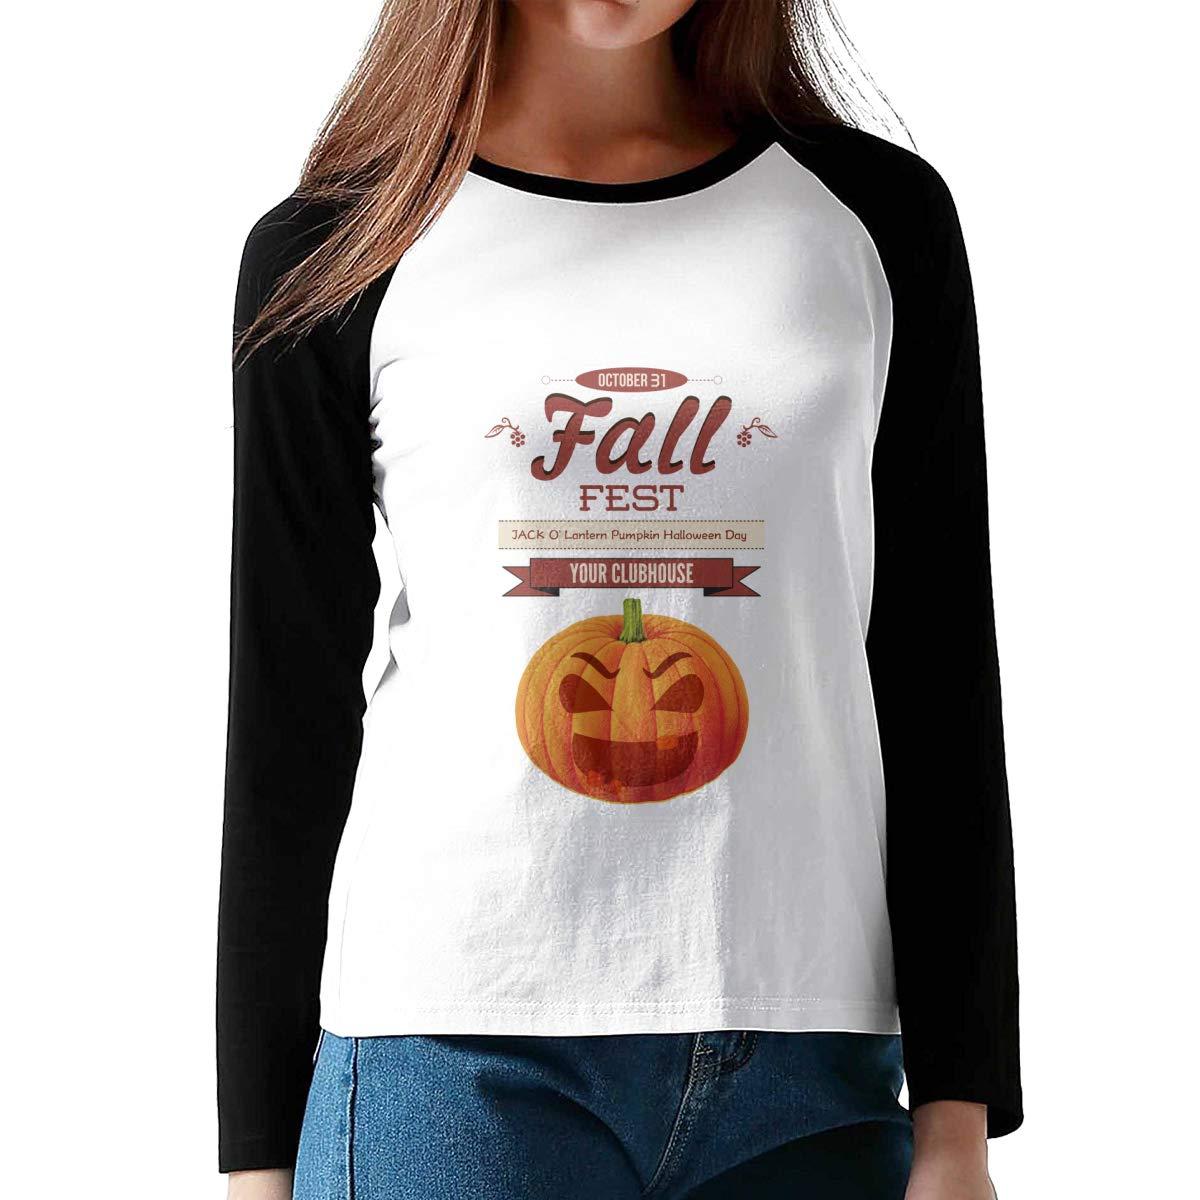 MiiyarHome Womens Long Sleeve Baseball T-Shirts Halloween Costume Girls Raglan/Sleeves Jersey Tee Shirt Black